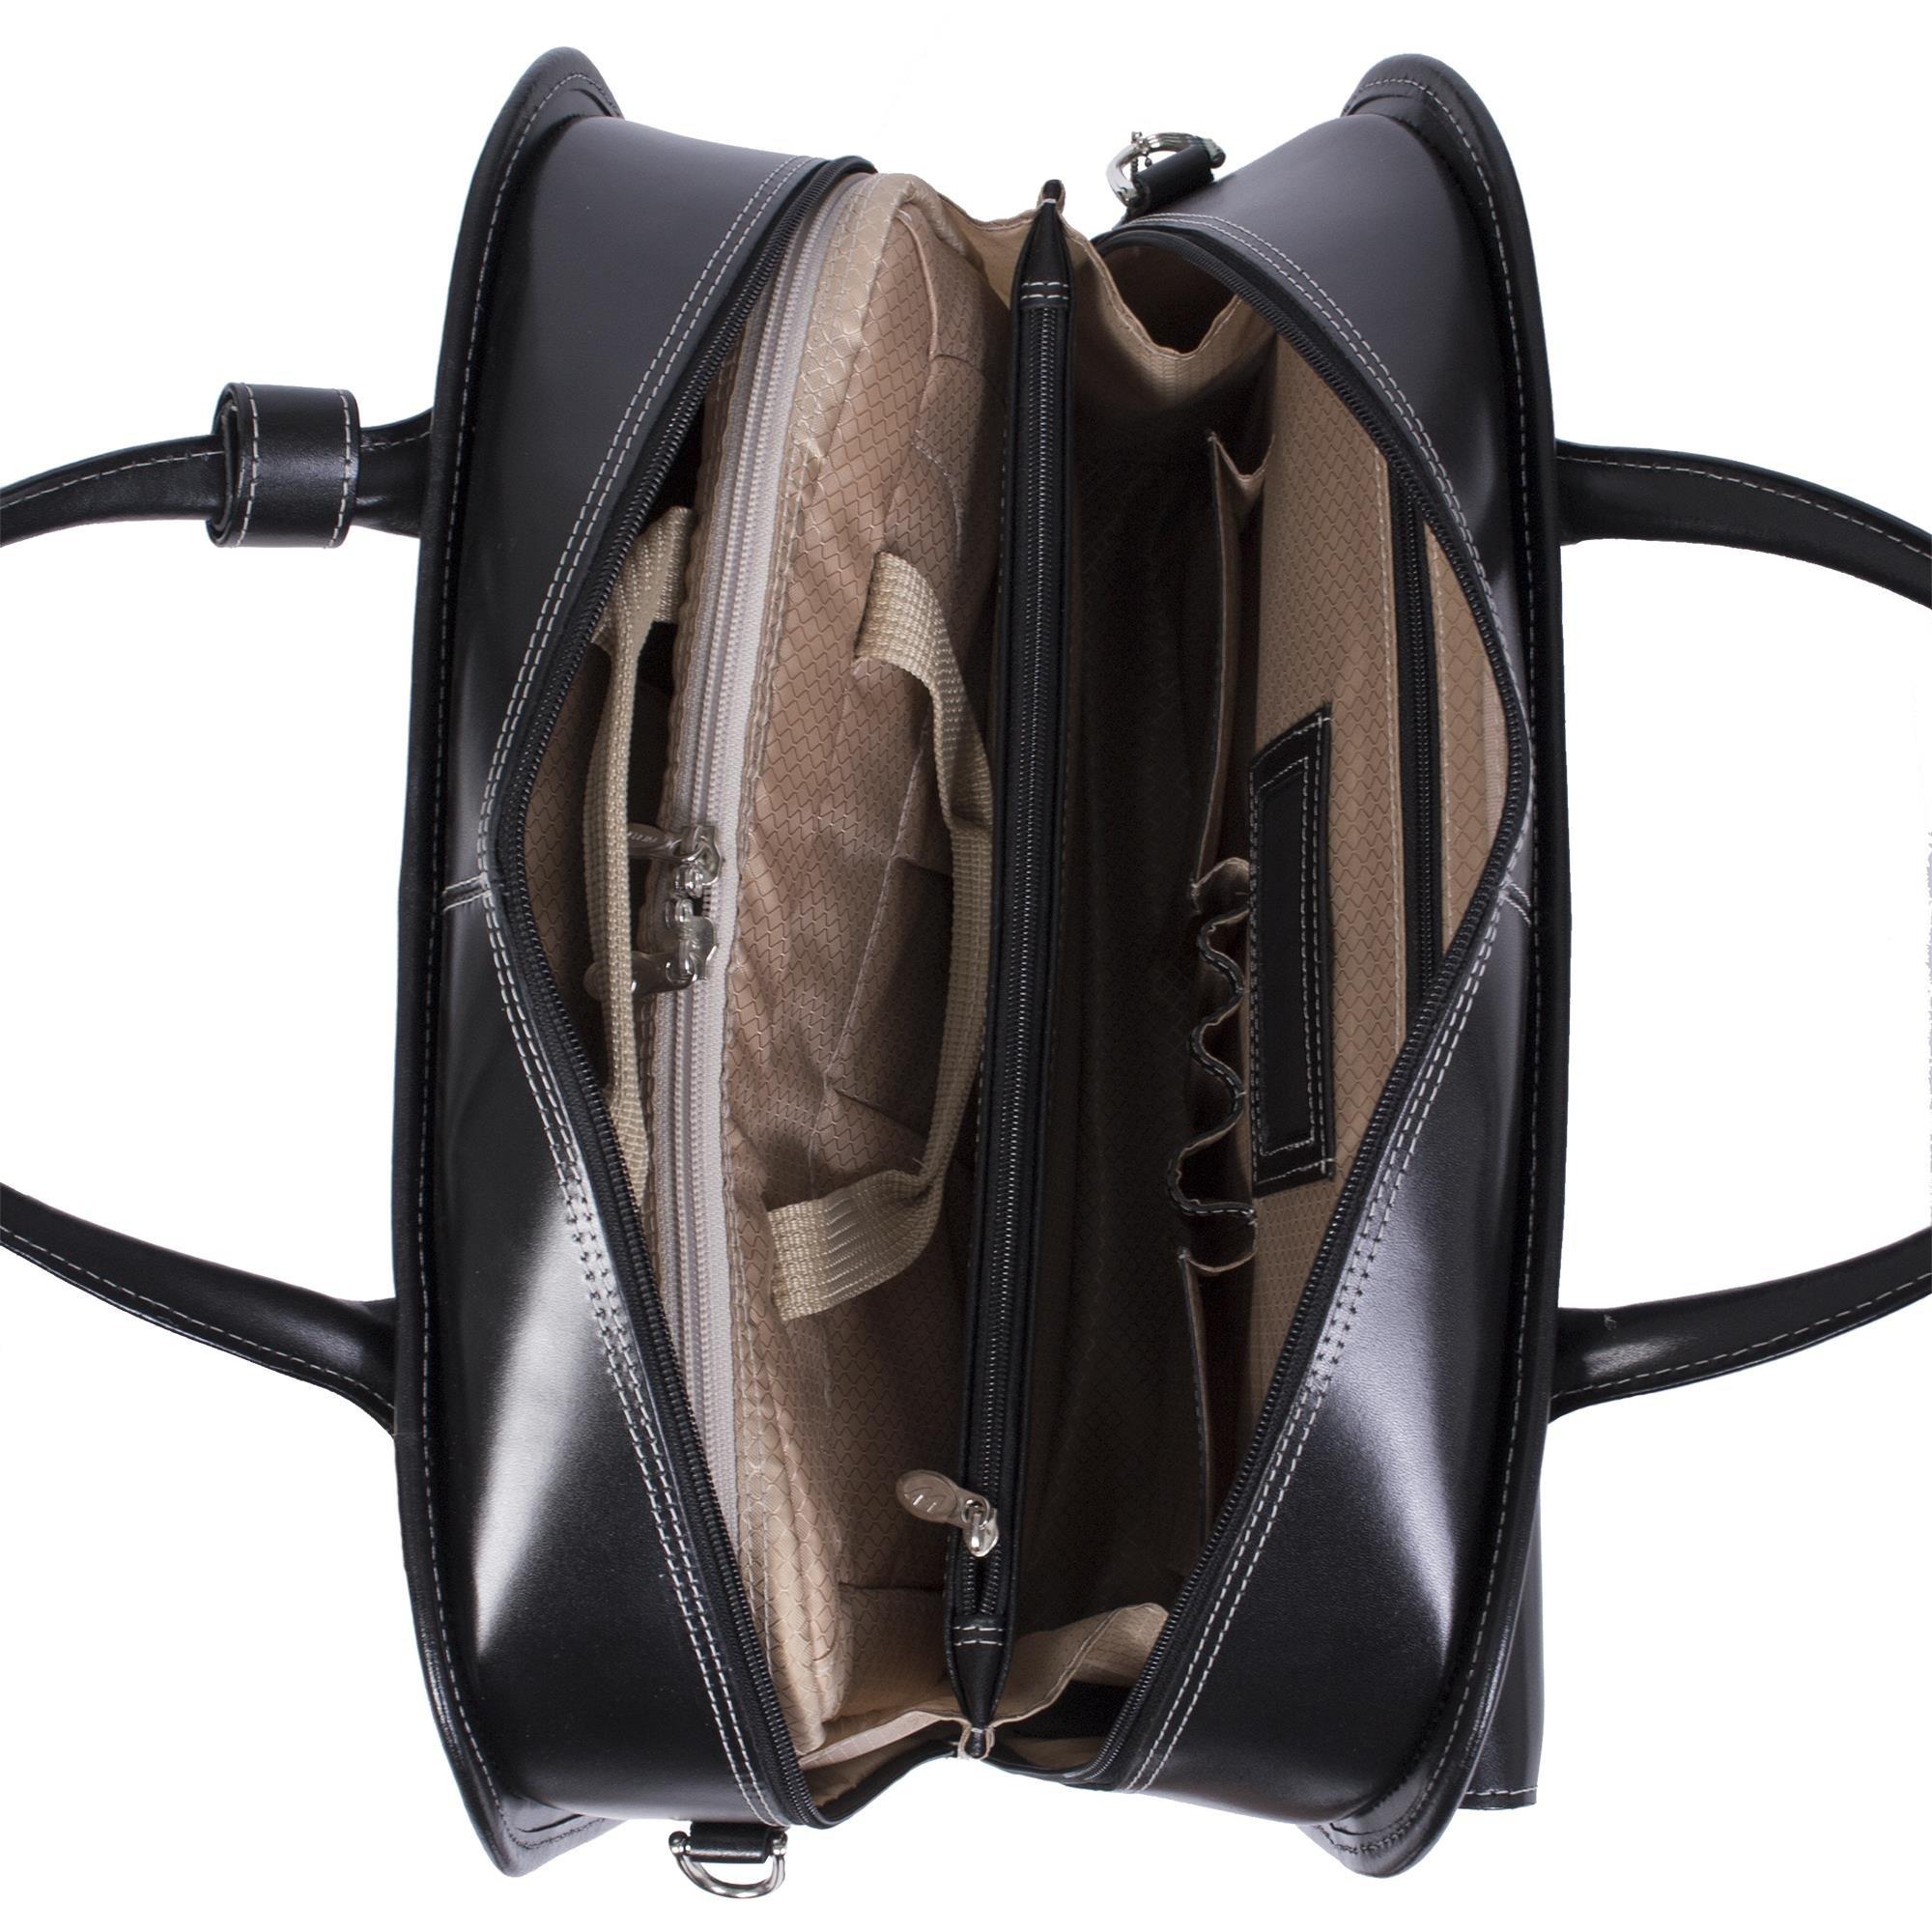 McKleinUSA LAKEWOOD 96615 Black Leather Fly-Through Checkpoint-Friendly Detachable-Wheeled Ladies' Briefcase by McKleinUSA (Image #5)